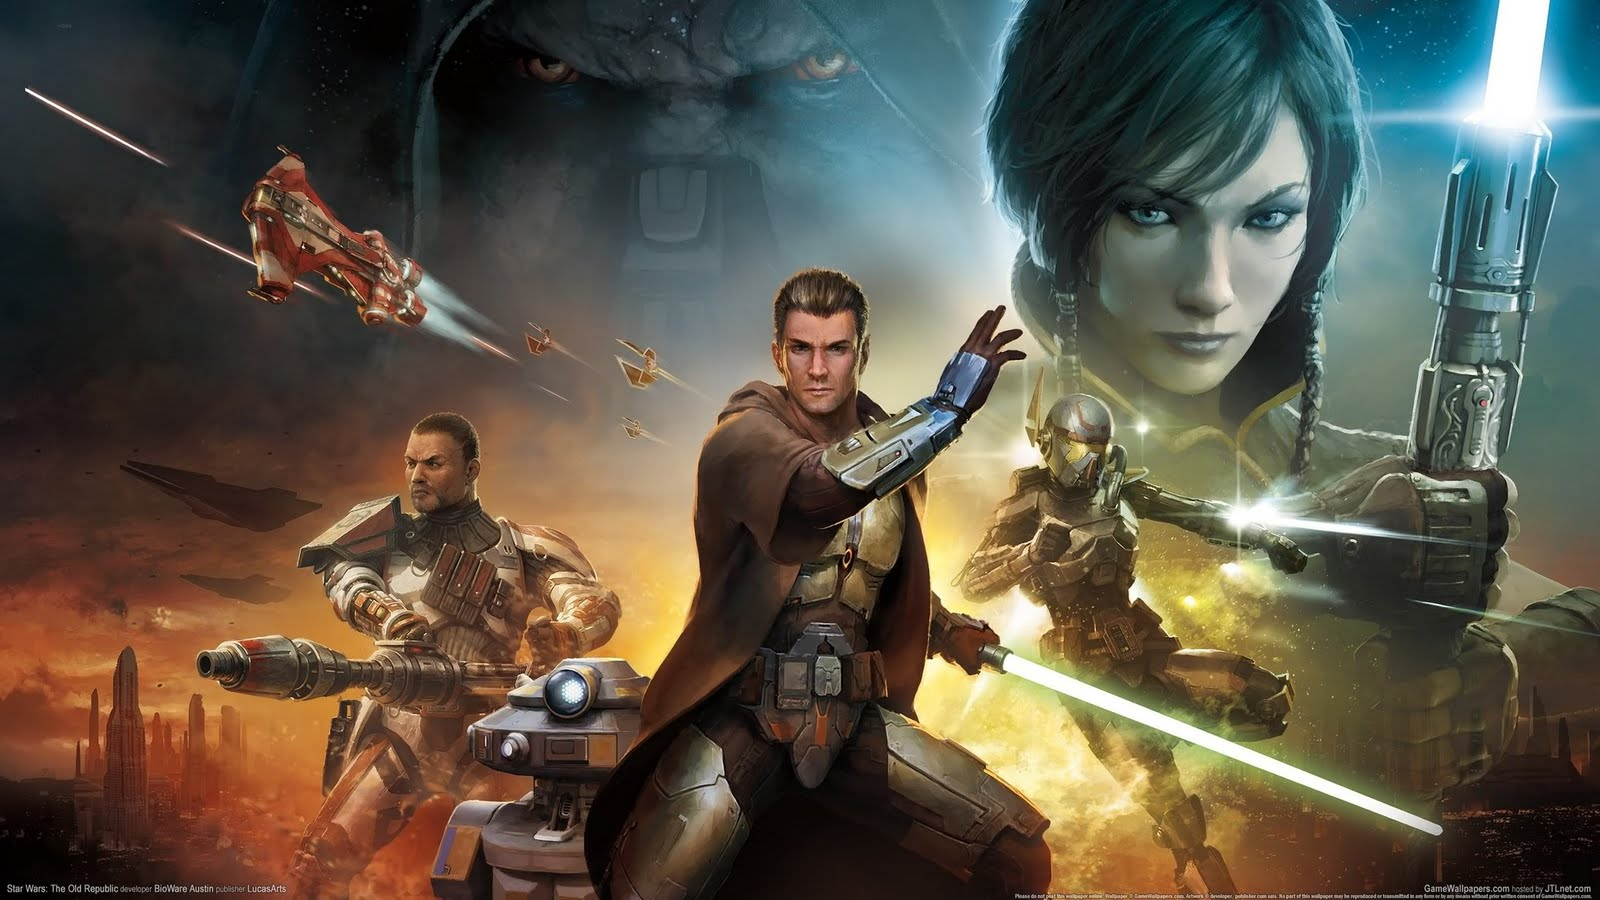 Star wars republic commando order 66 - 5